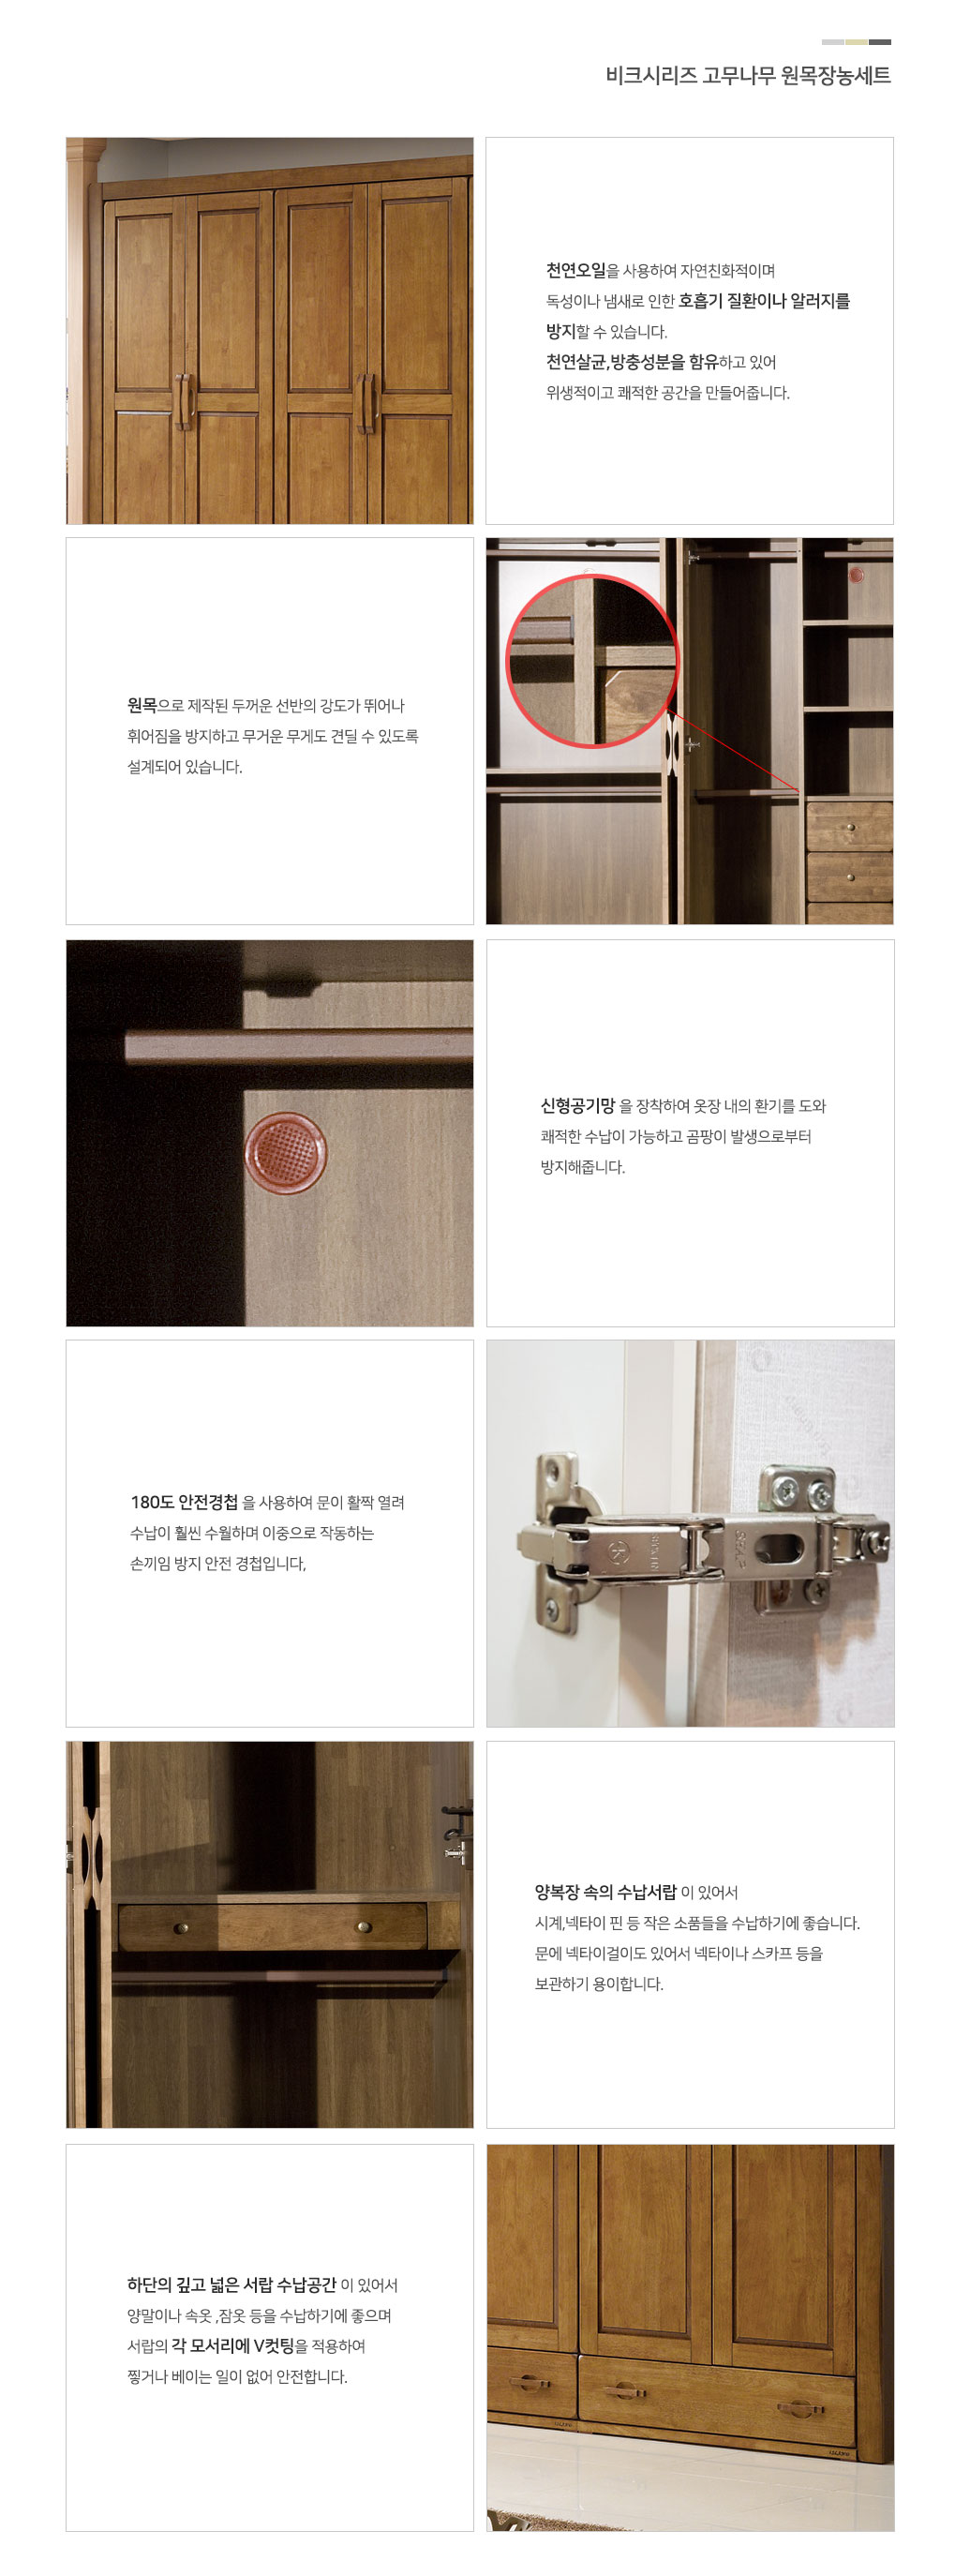 veek_closet_04.jpg